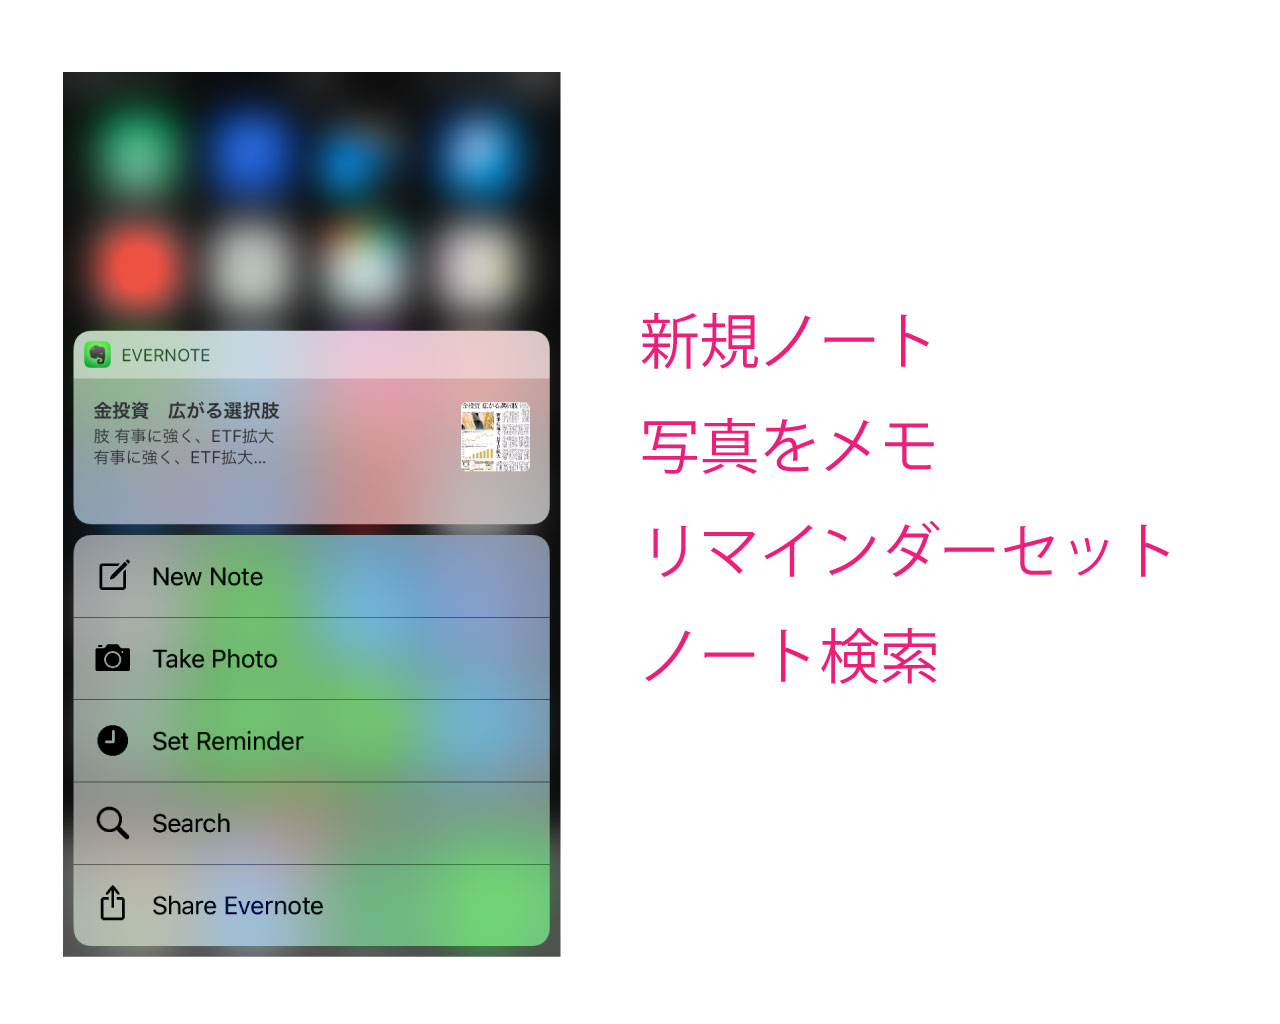 iphone-3dtouch-app-icon-shortcut-memu-3